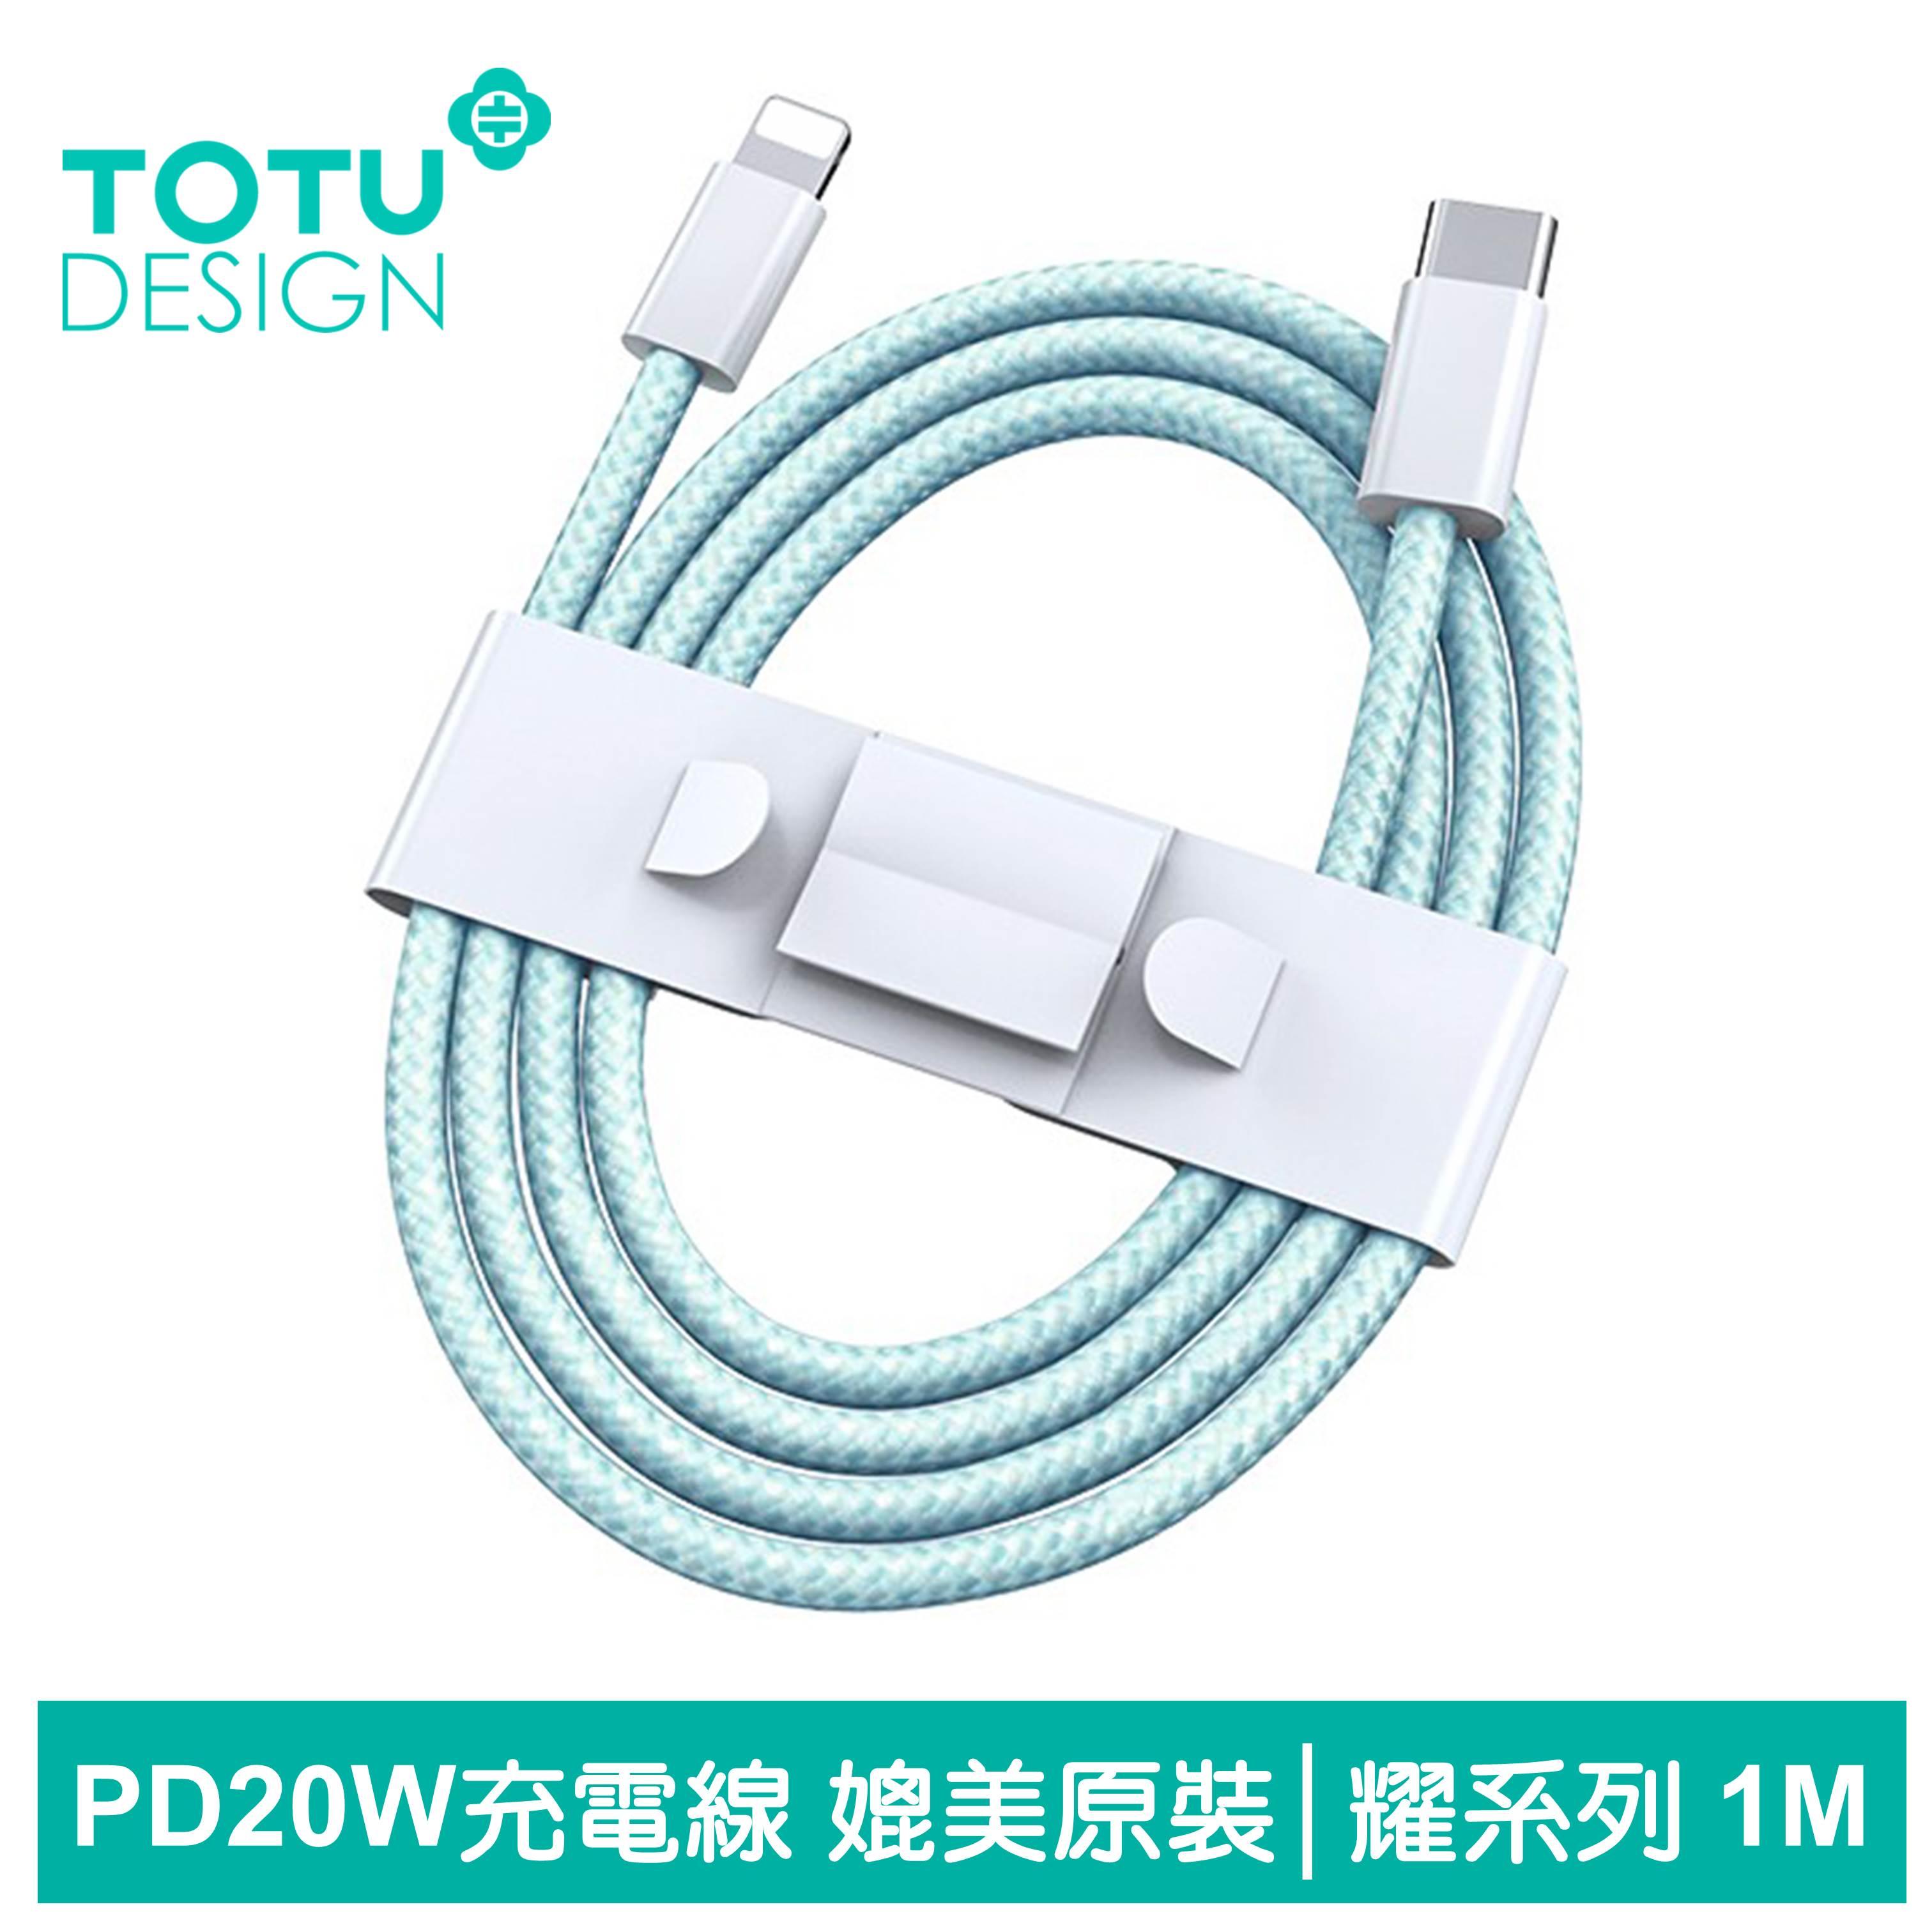 TOTU台灣官方 PD/Lightning/Type-C/iPhone充電線傳輸線編織快充線 20W 媲美原裝 耀系列 1M 綠色